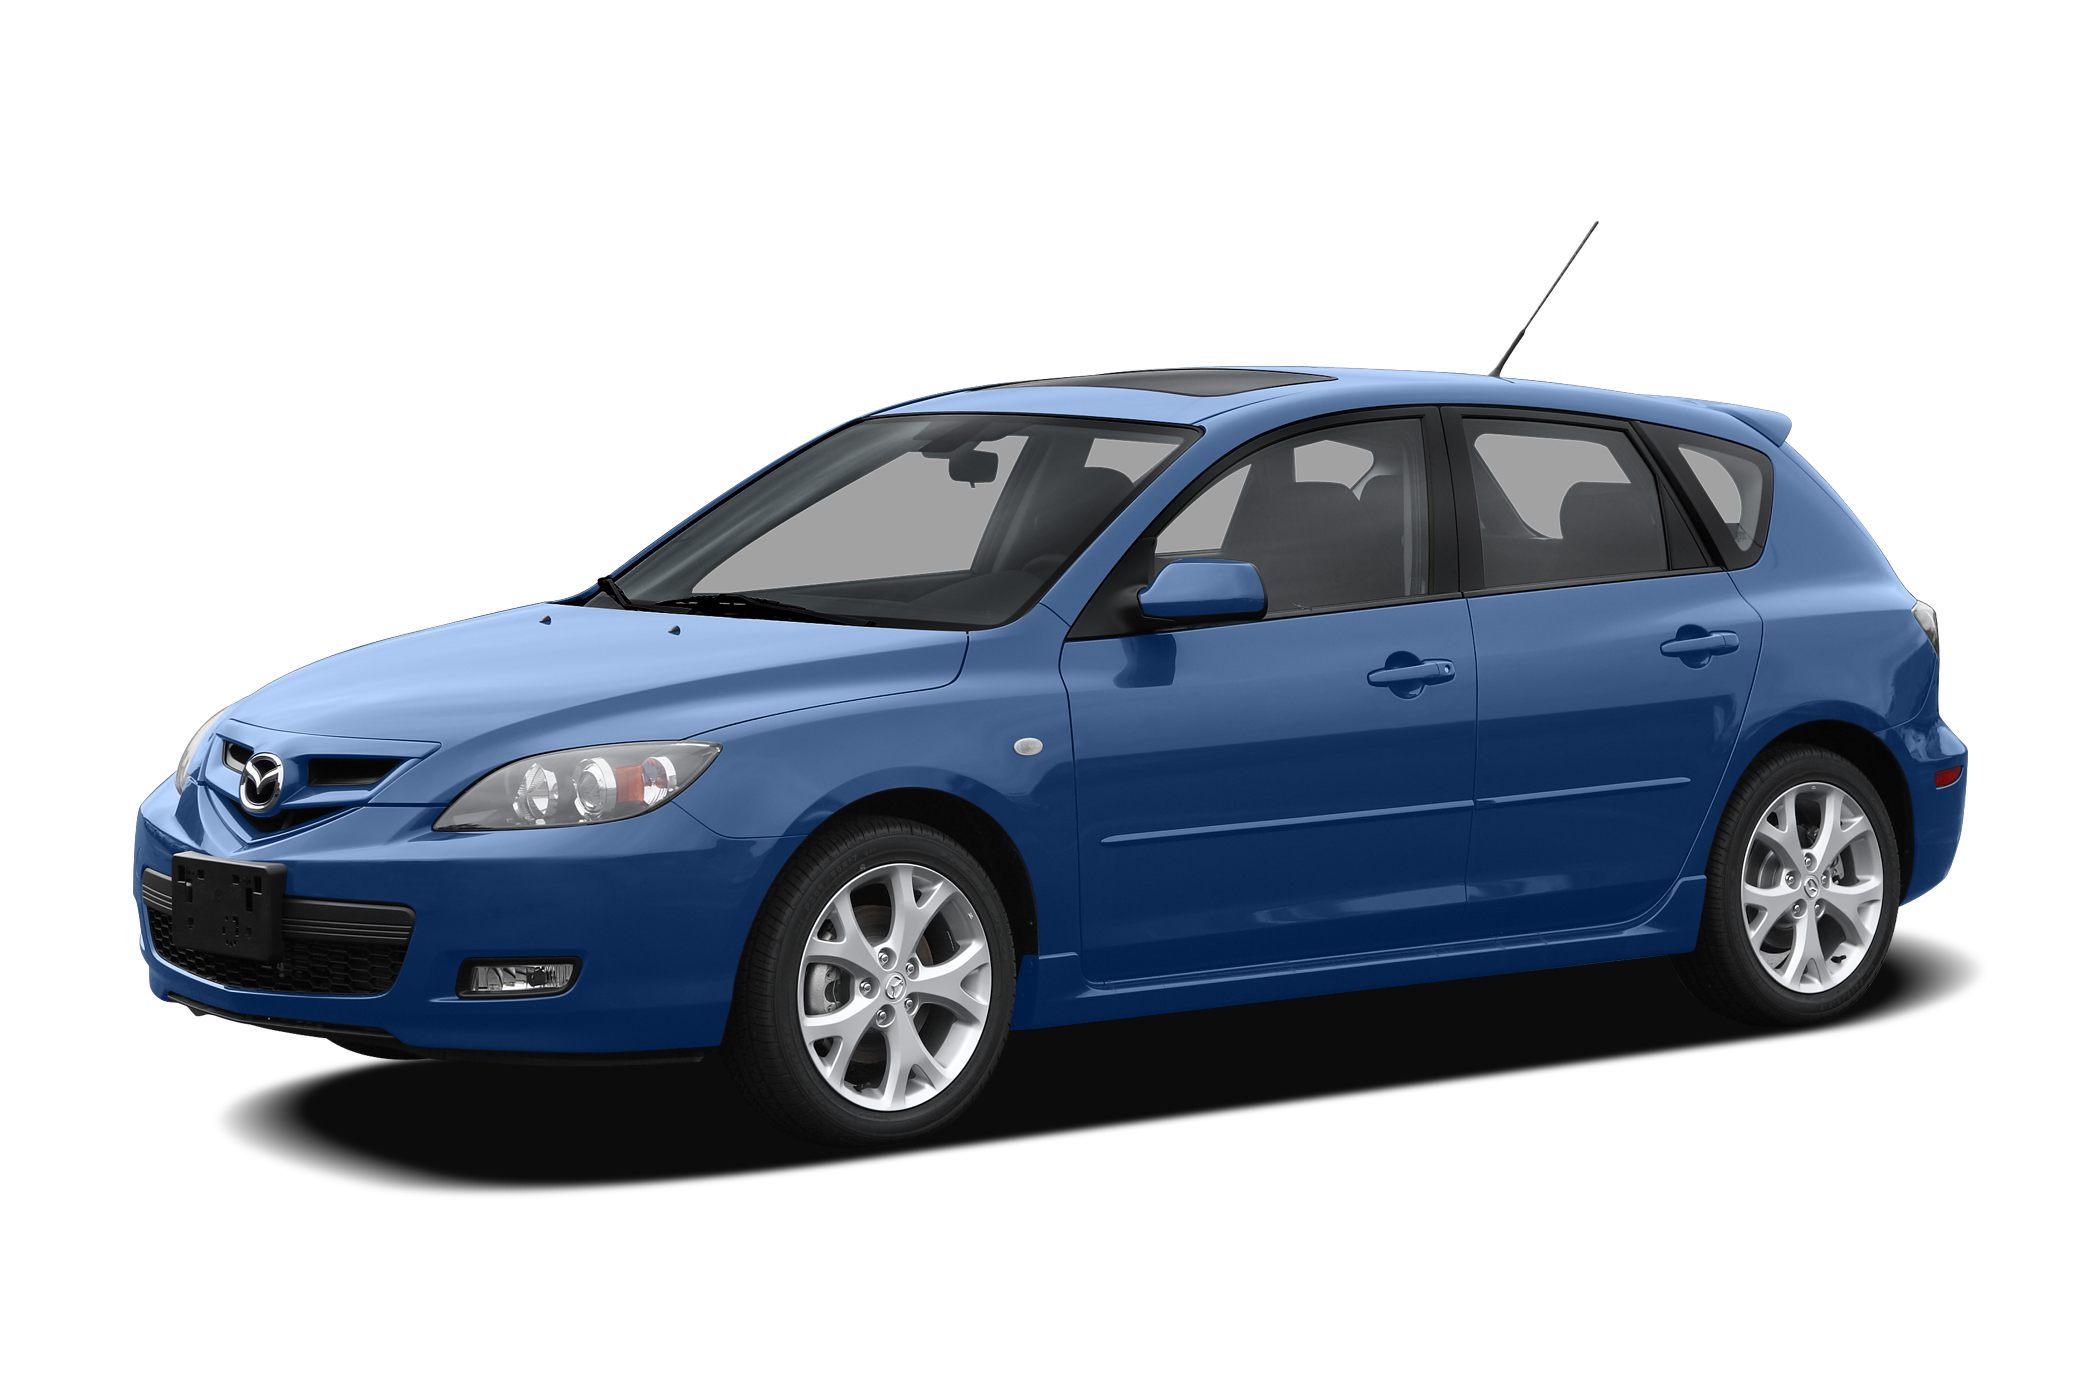 2009 mazda mazda3 s sport 4dr hatchback specs and prices